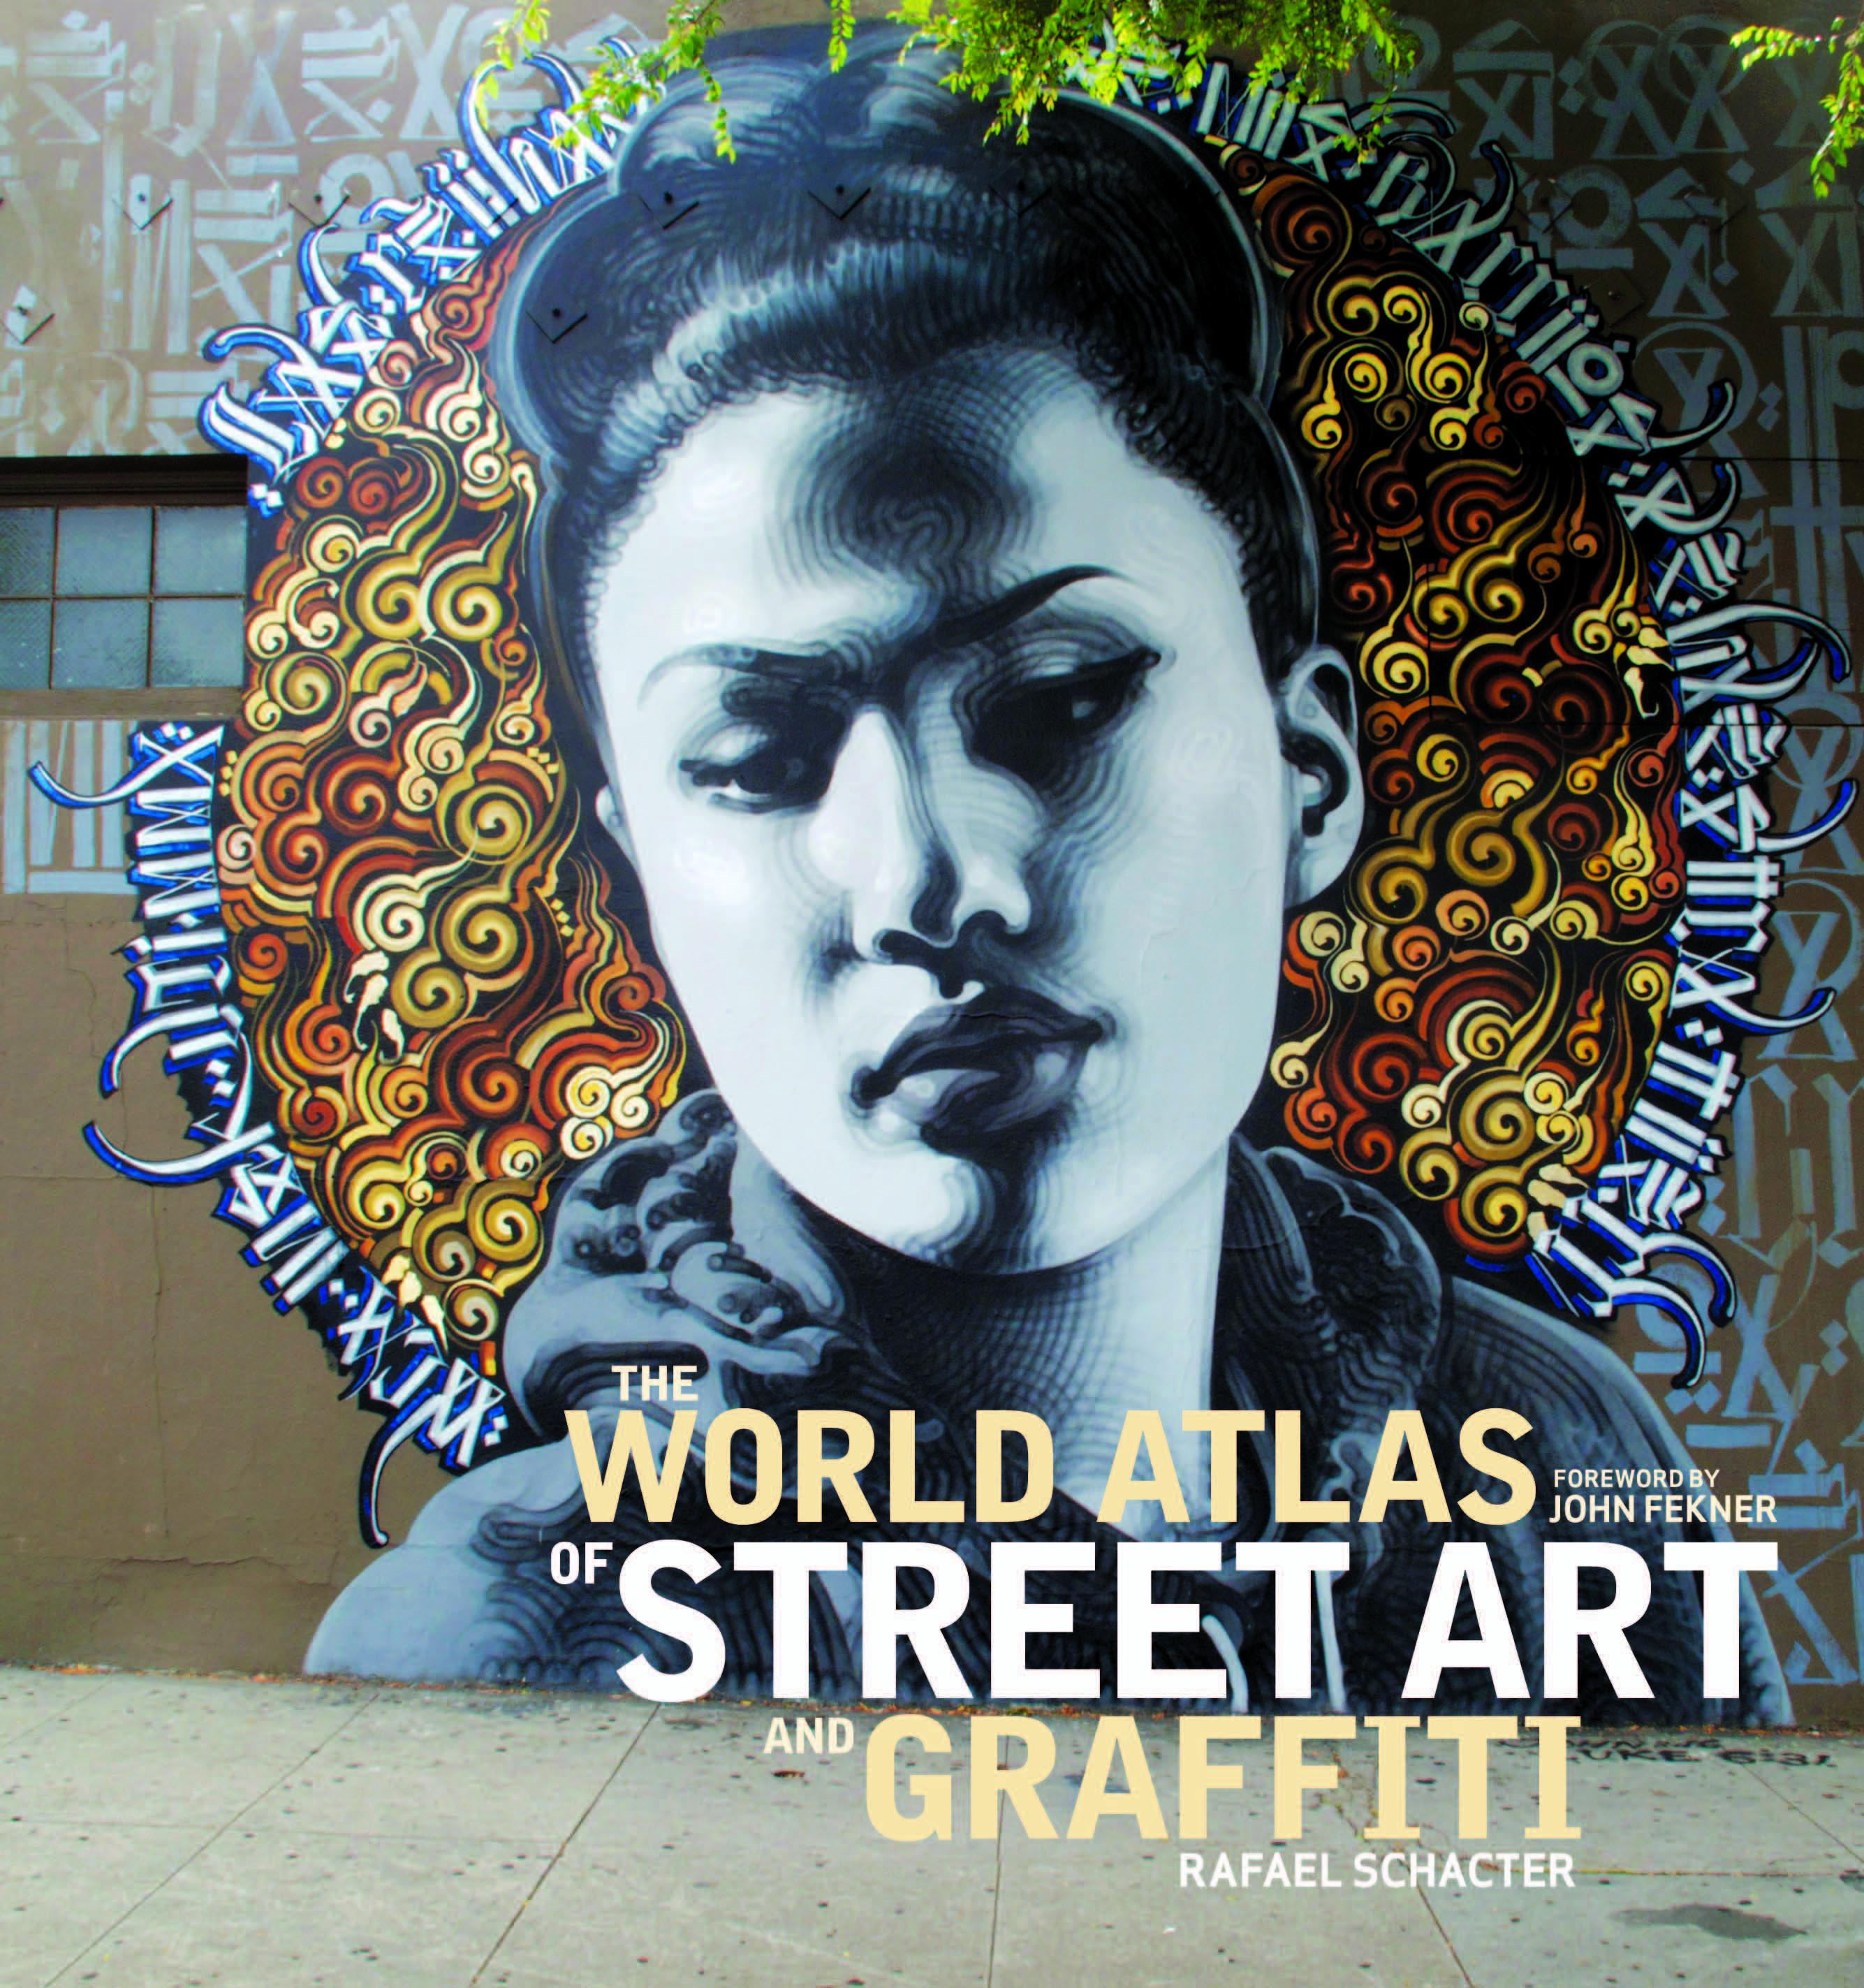 "NYC Book Launch: The World Atlas of Street Art and Graffiti by Rafael Schacter, with Ron English, David ""Chino"" Villorente, and Katsu"